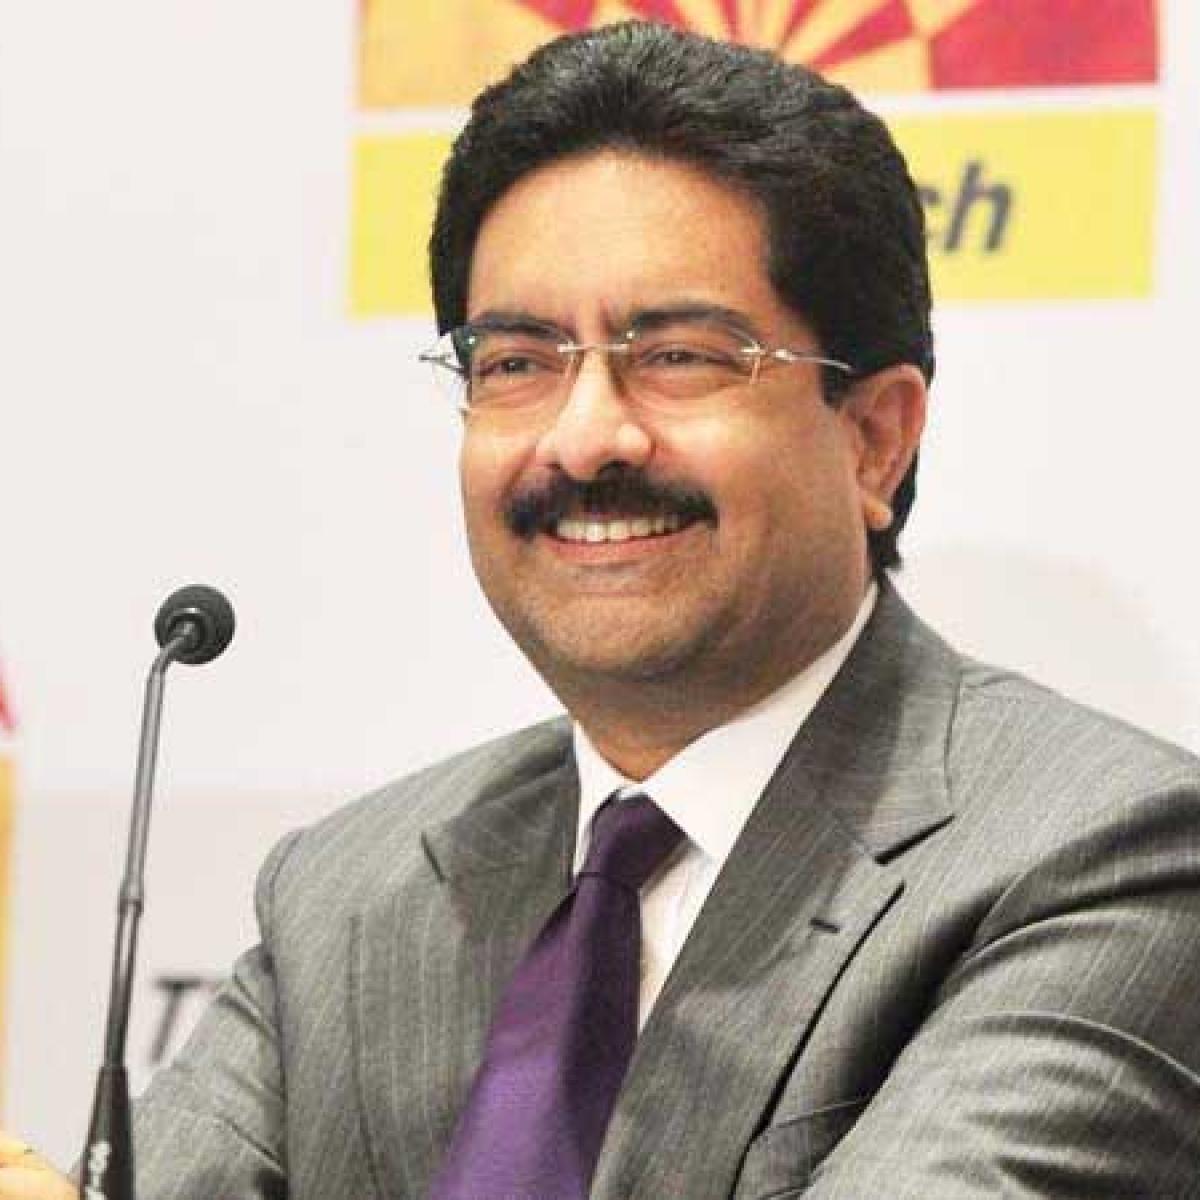 Vodafone Idea will shut in absence of govt relief: Kumar Mangalam Birla